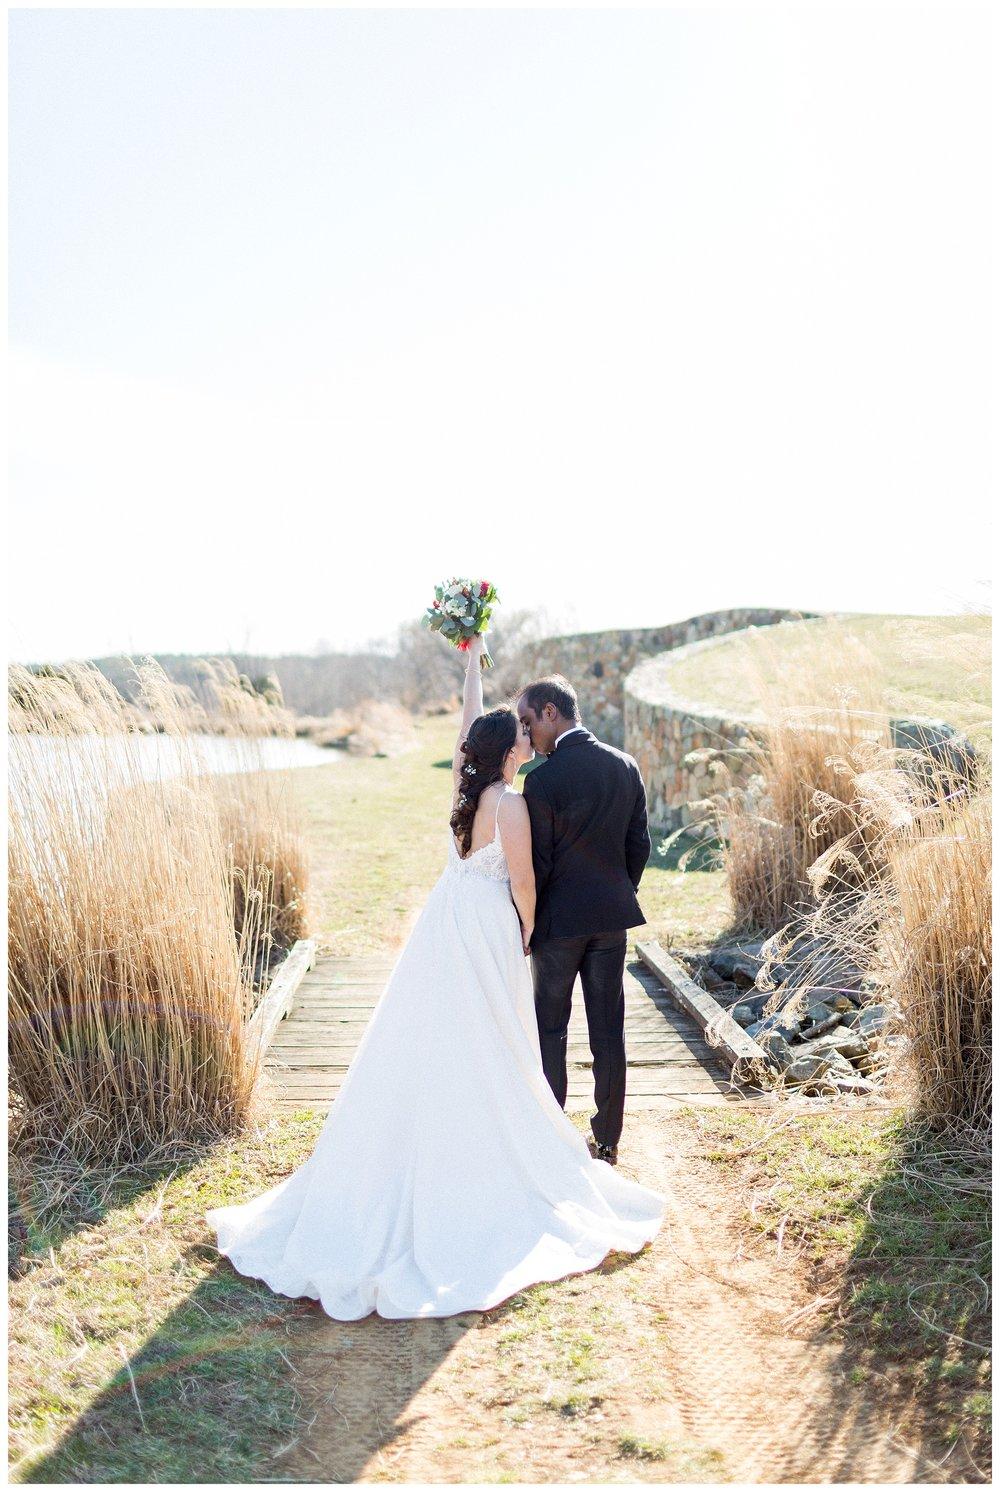 Stone Tower Winery Wedding | Virginia Winter Wedding | VA Wedding Photographer Kir Tuben_0047.jpg